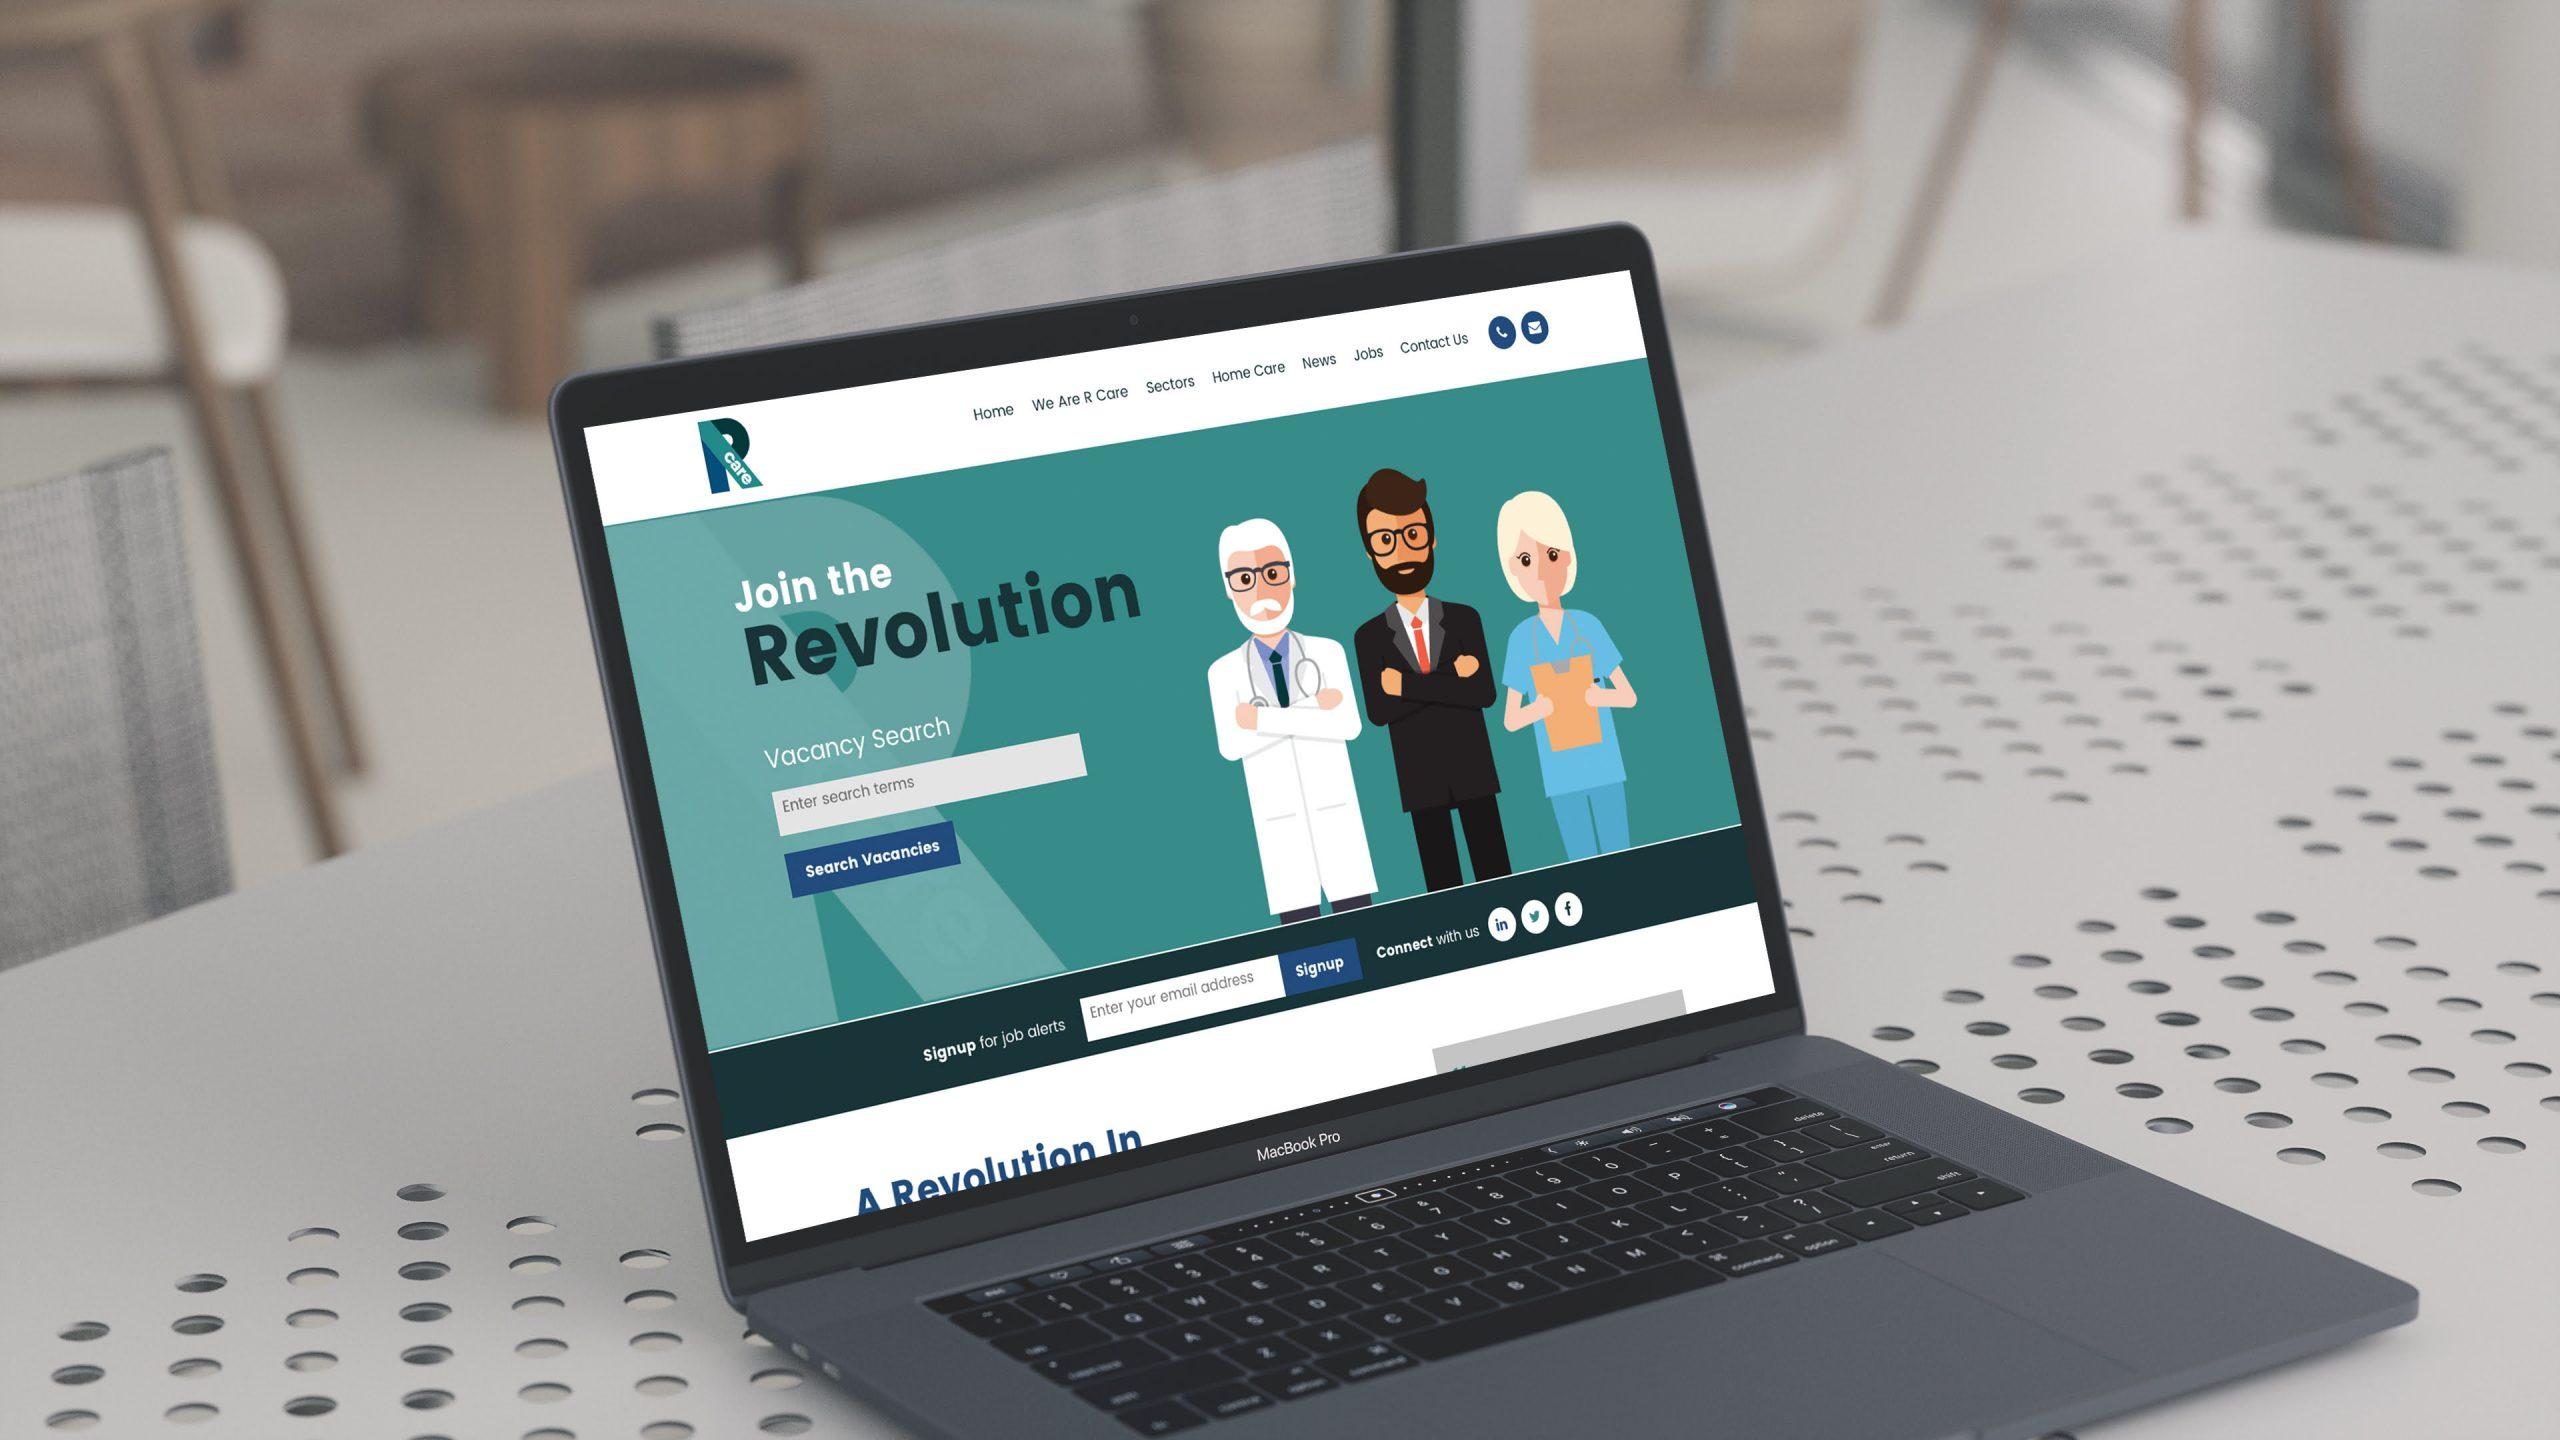 R Care website displayed on laptop